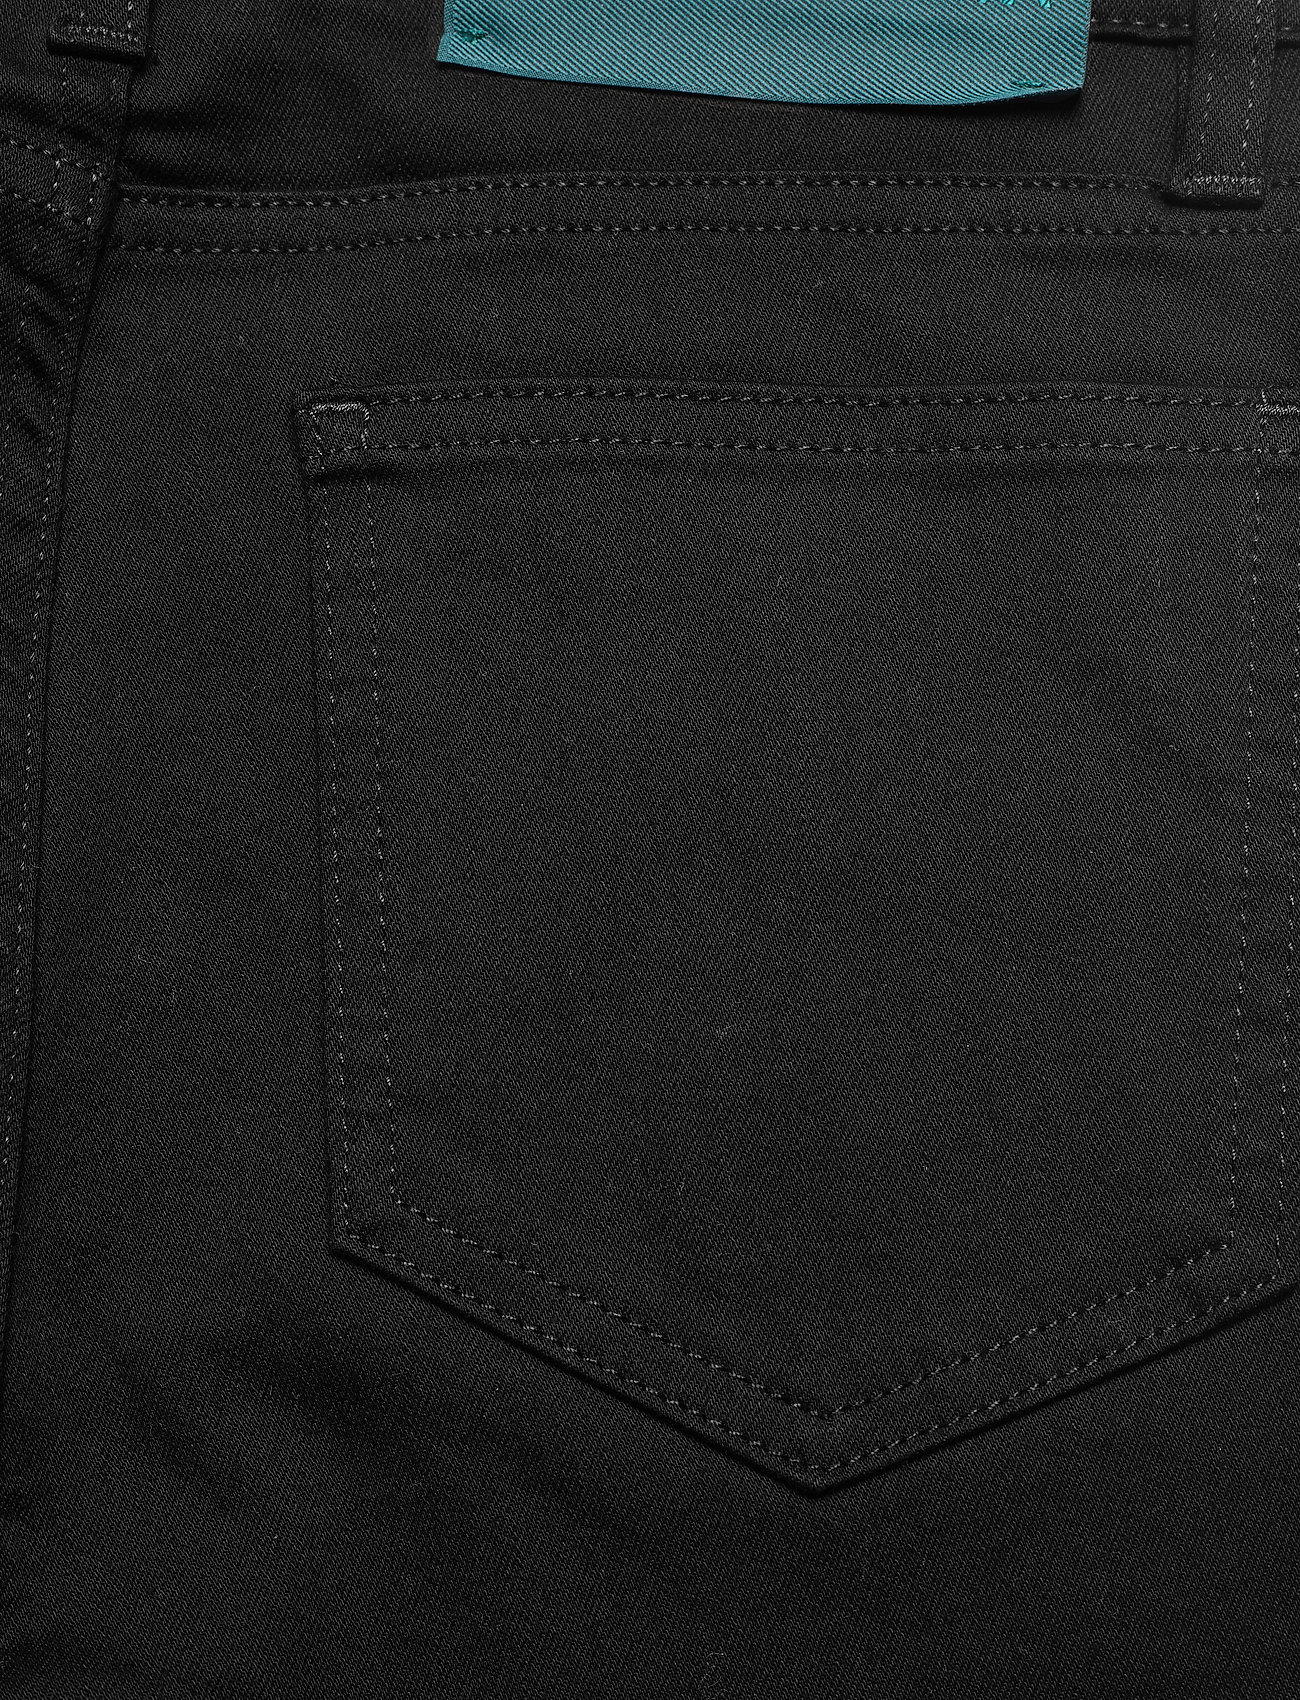 Self Cinema - Womens Skinny Jean - skinny jeans - stay black - 4